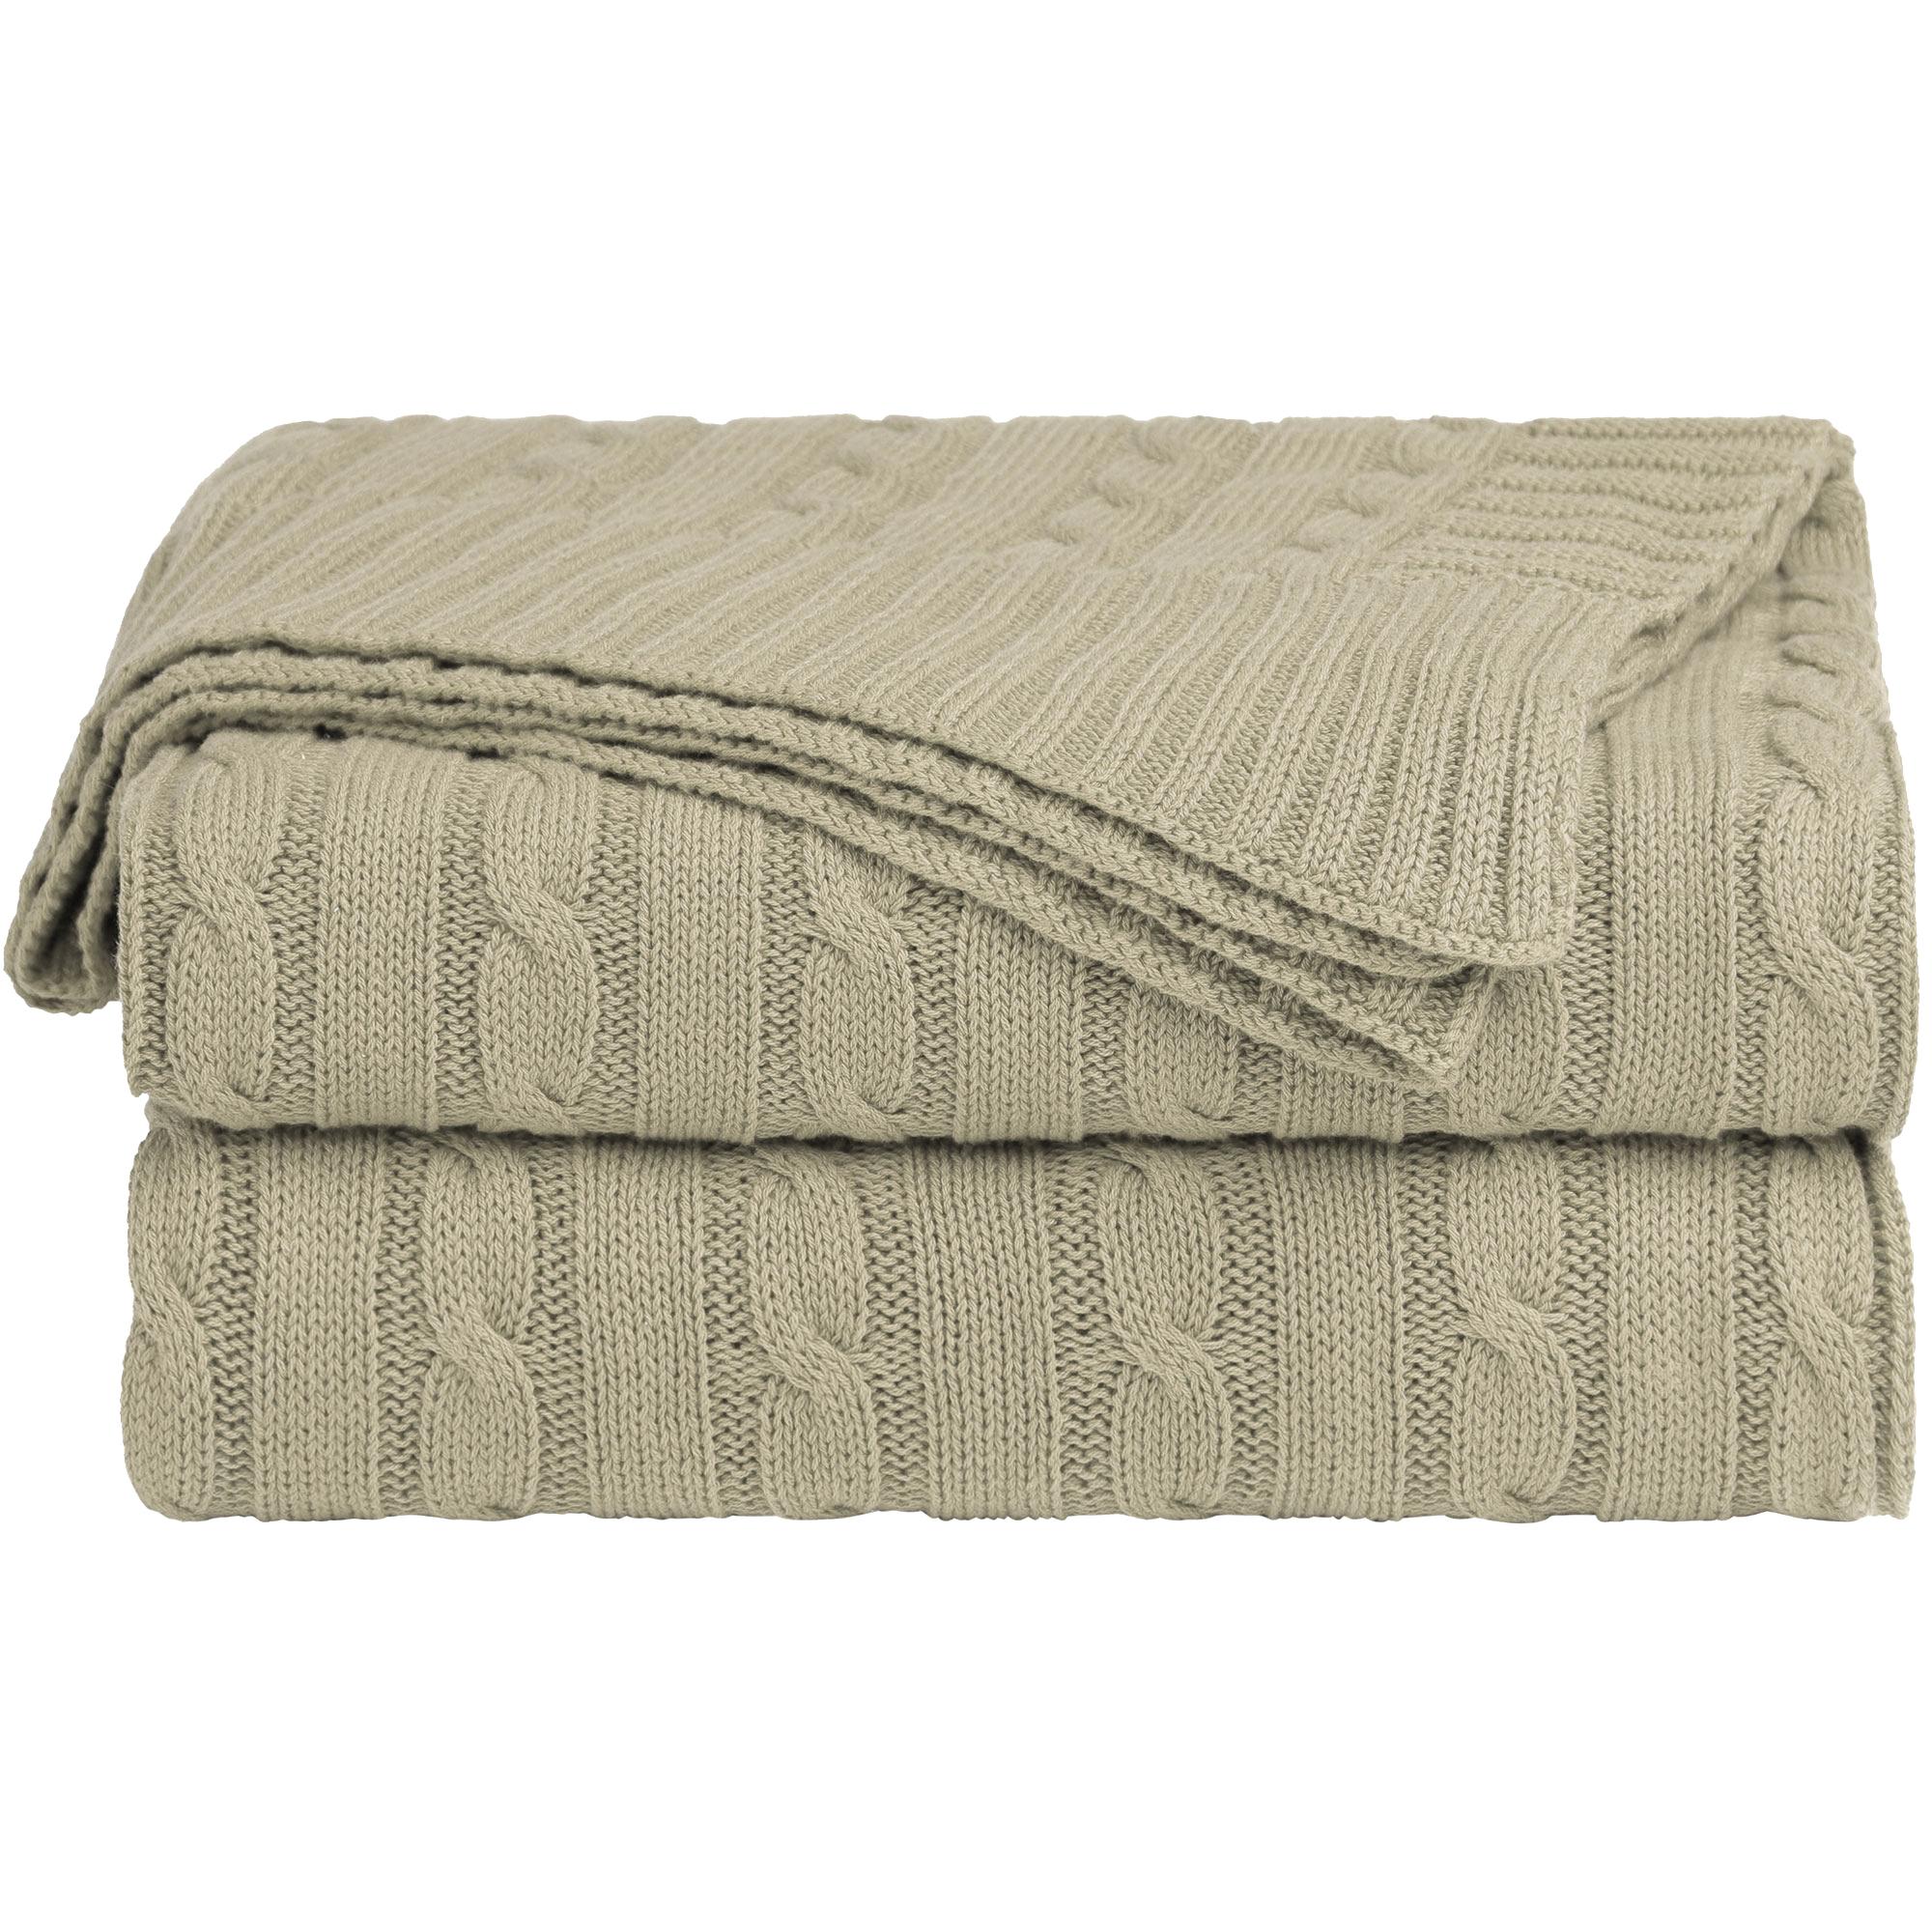 Home Decor 100% Cotton Soft Cable Knit Throw Blanket Khaki